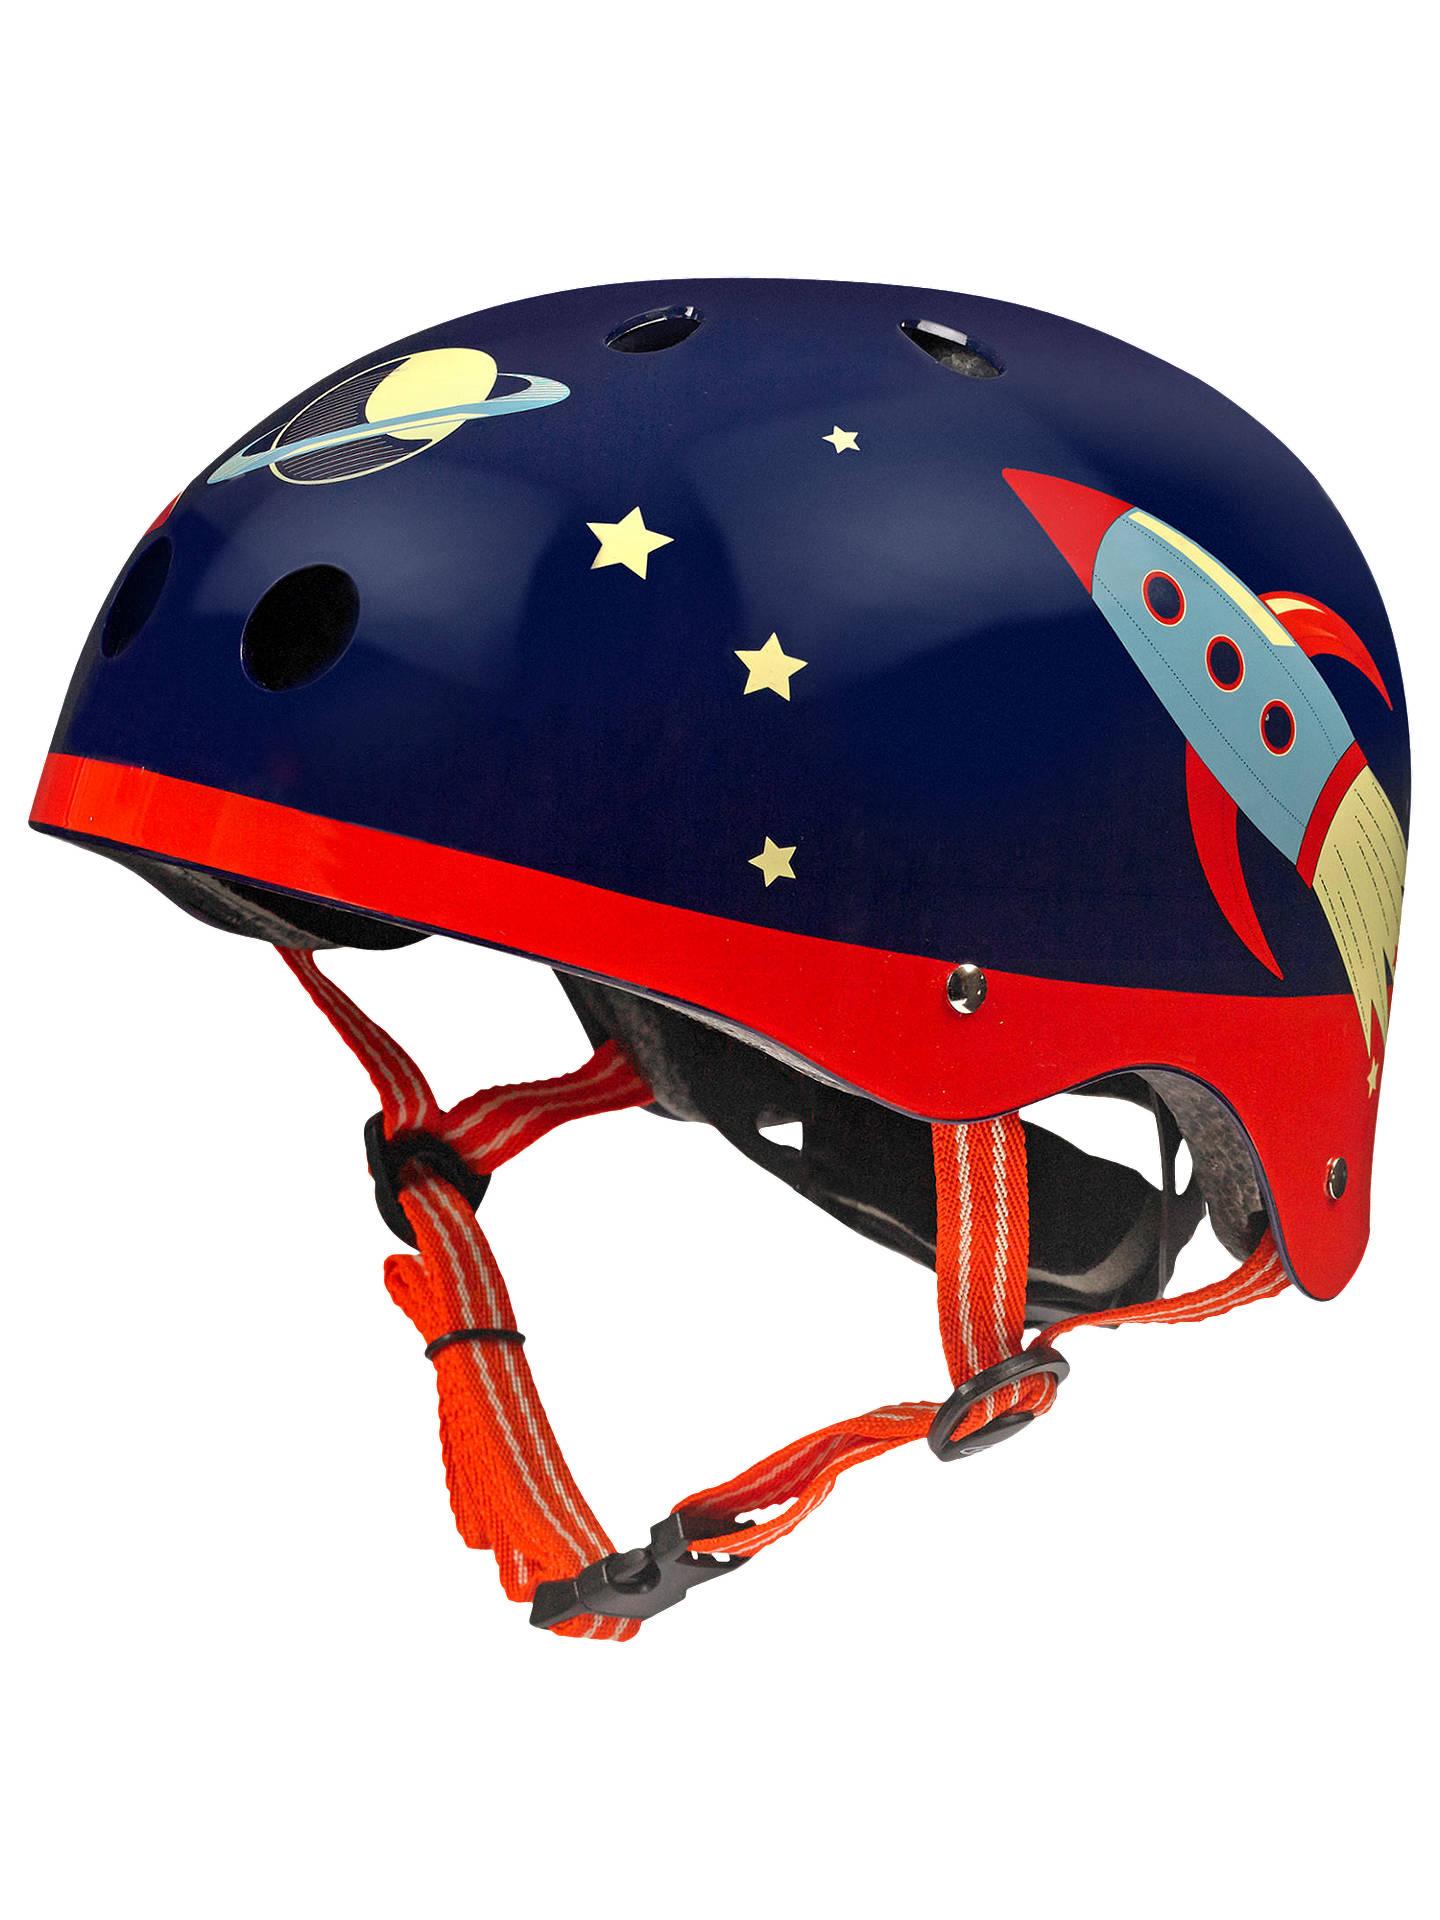 Micro Childrens Helmet Retro Rocket Medium